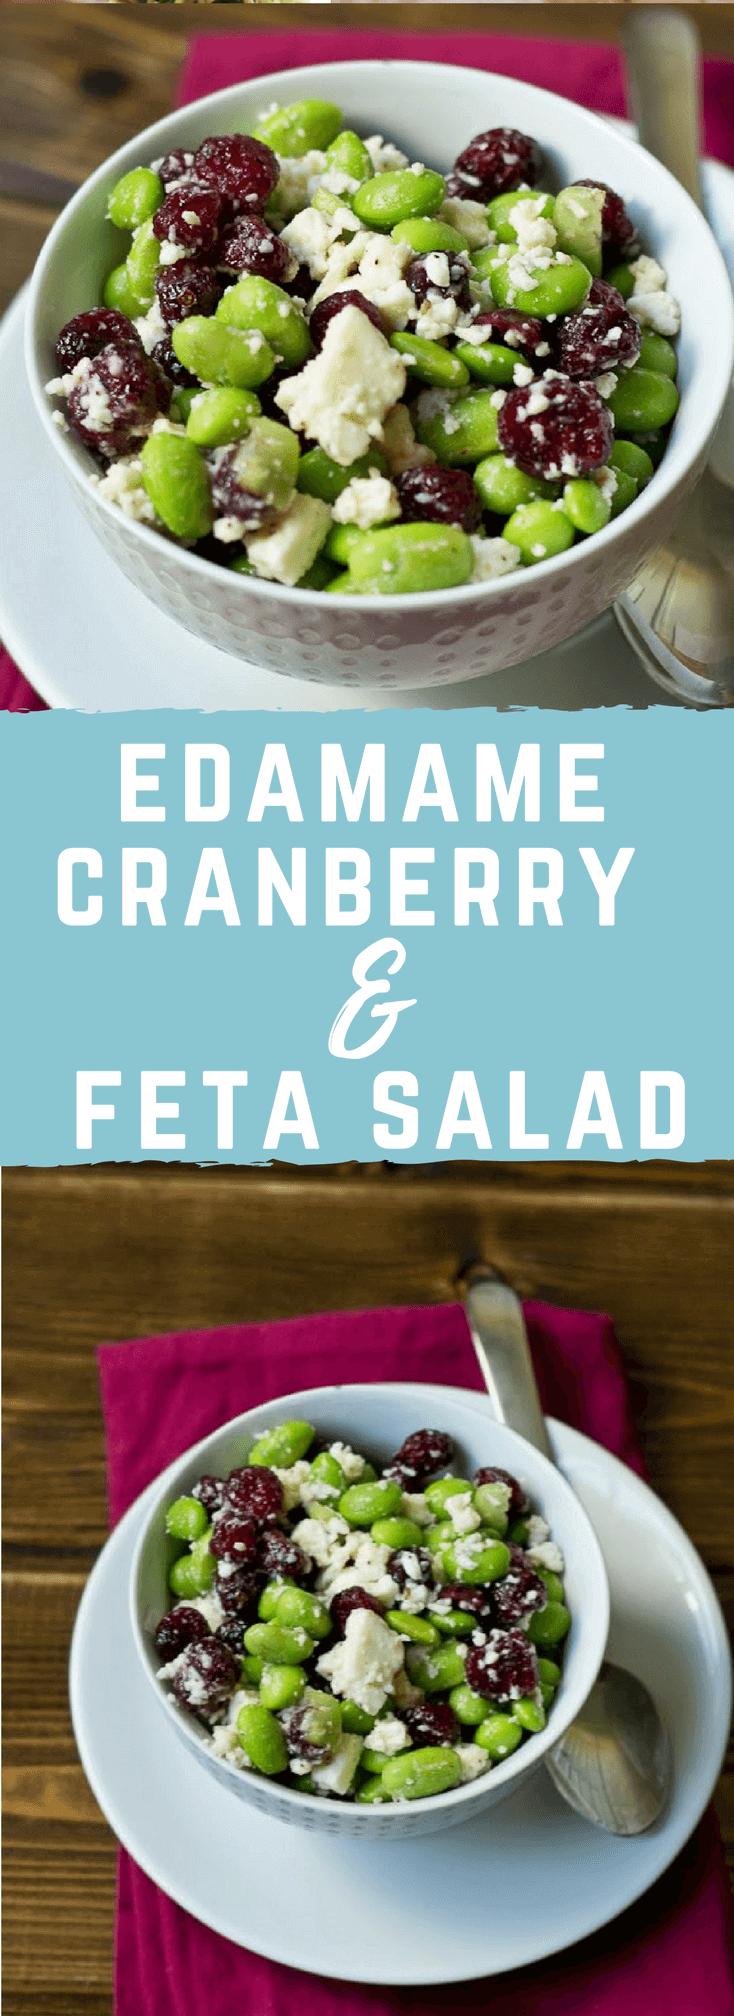 Edamame Cranberry Feta Salad | Gluten Free Vegetarian Side Dish ...